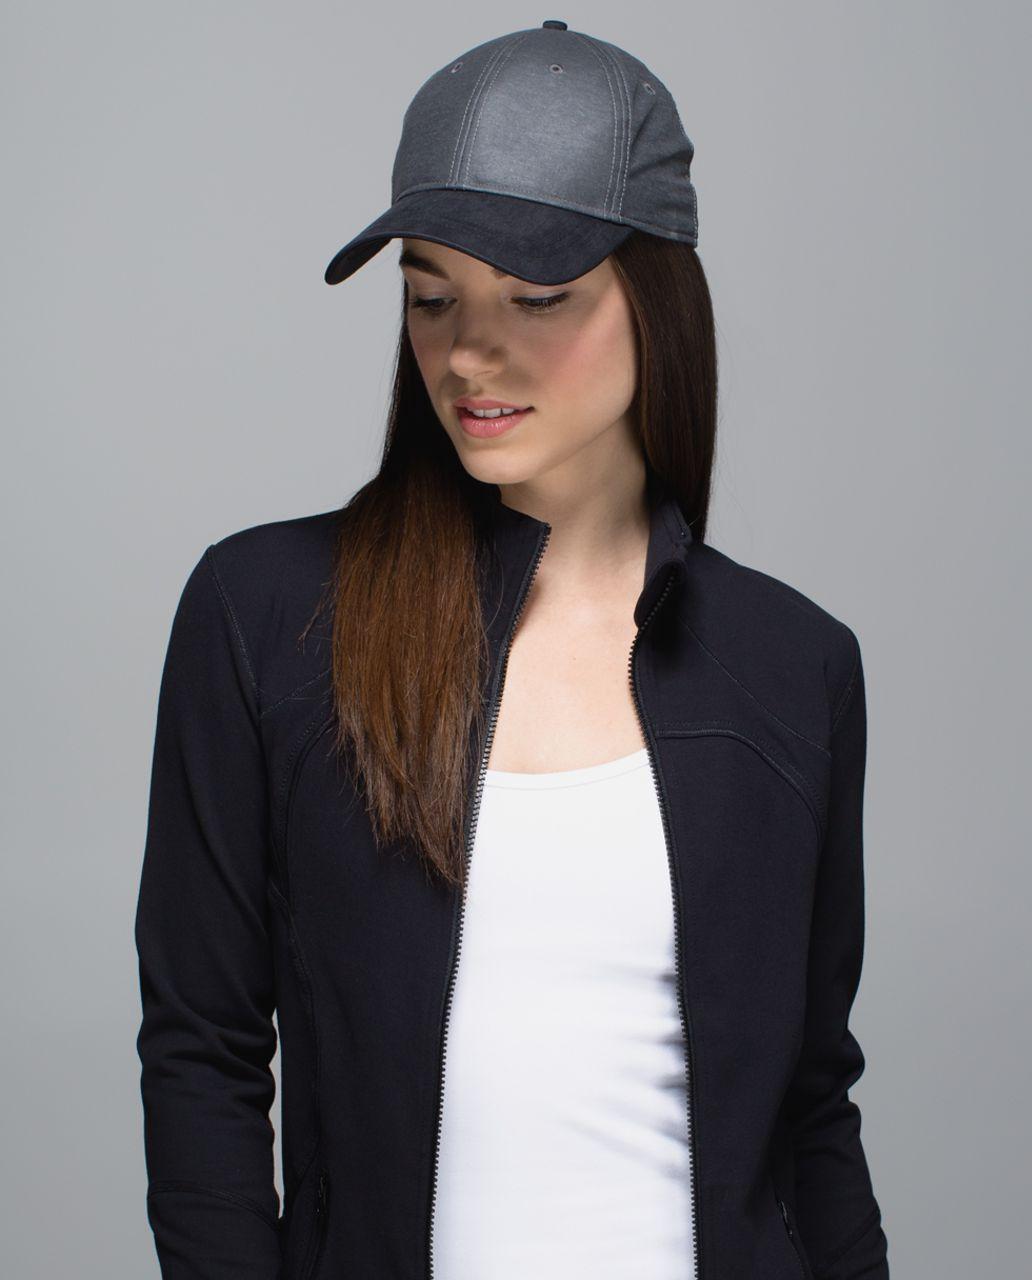 Lululemon Baller Hat - Heathered Black /  Black